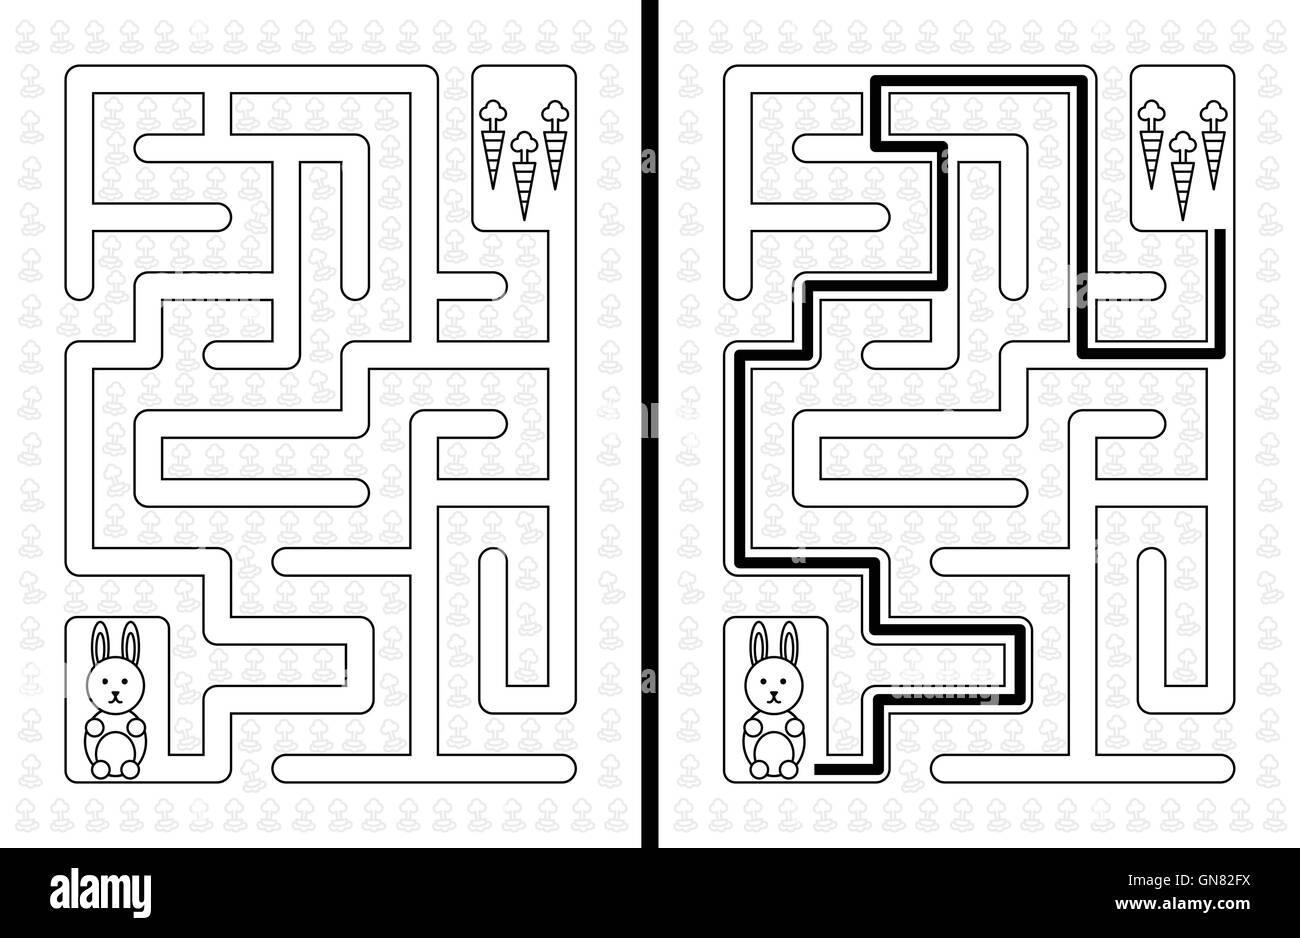 Easy Rabbit Maze Stock Vector Art Amp Illustration Vector